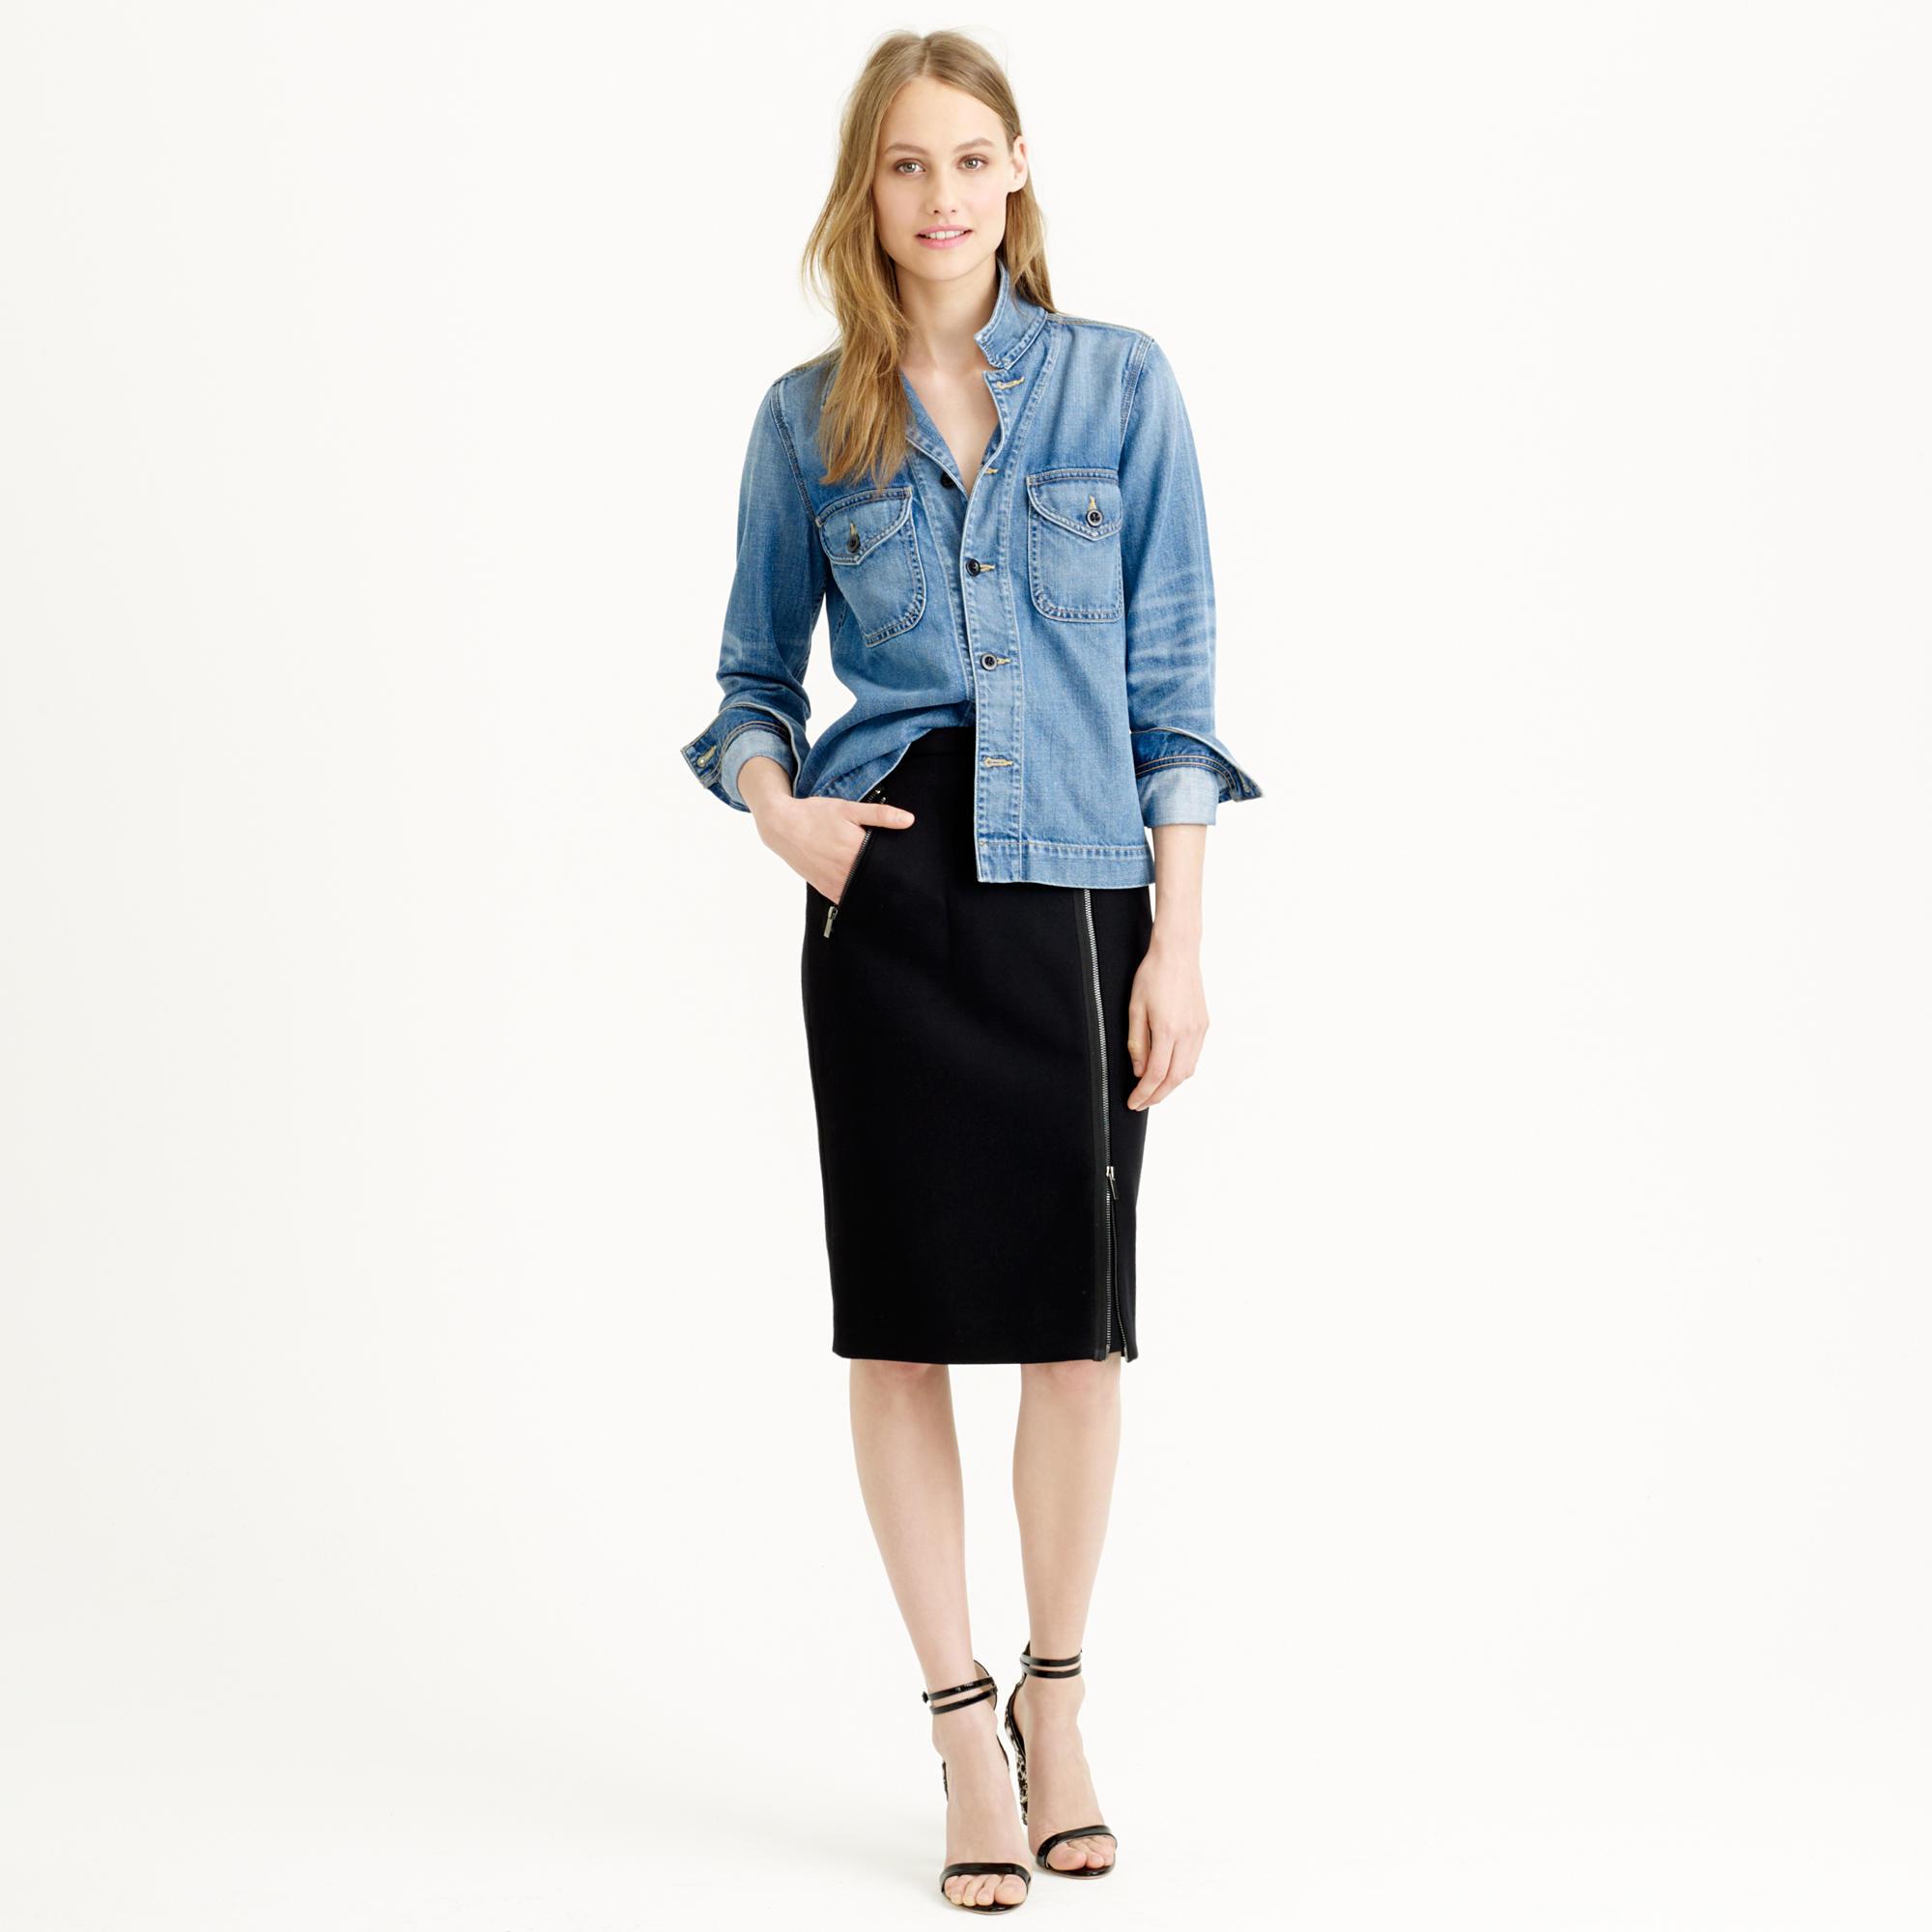 j crew asymmetrical zip pencil skirt in wool in black lyst